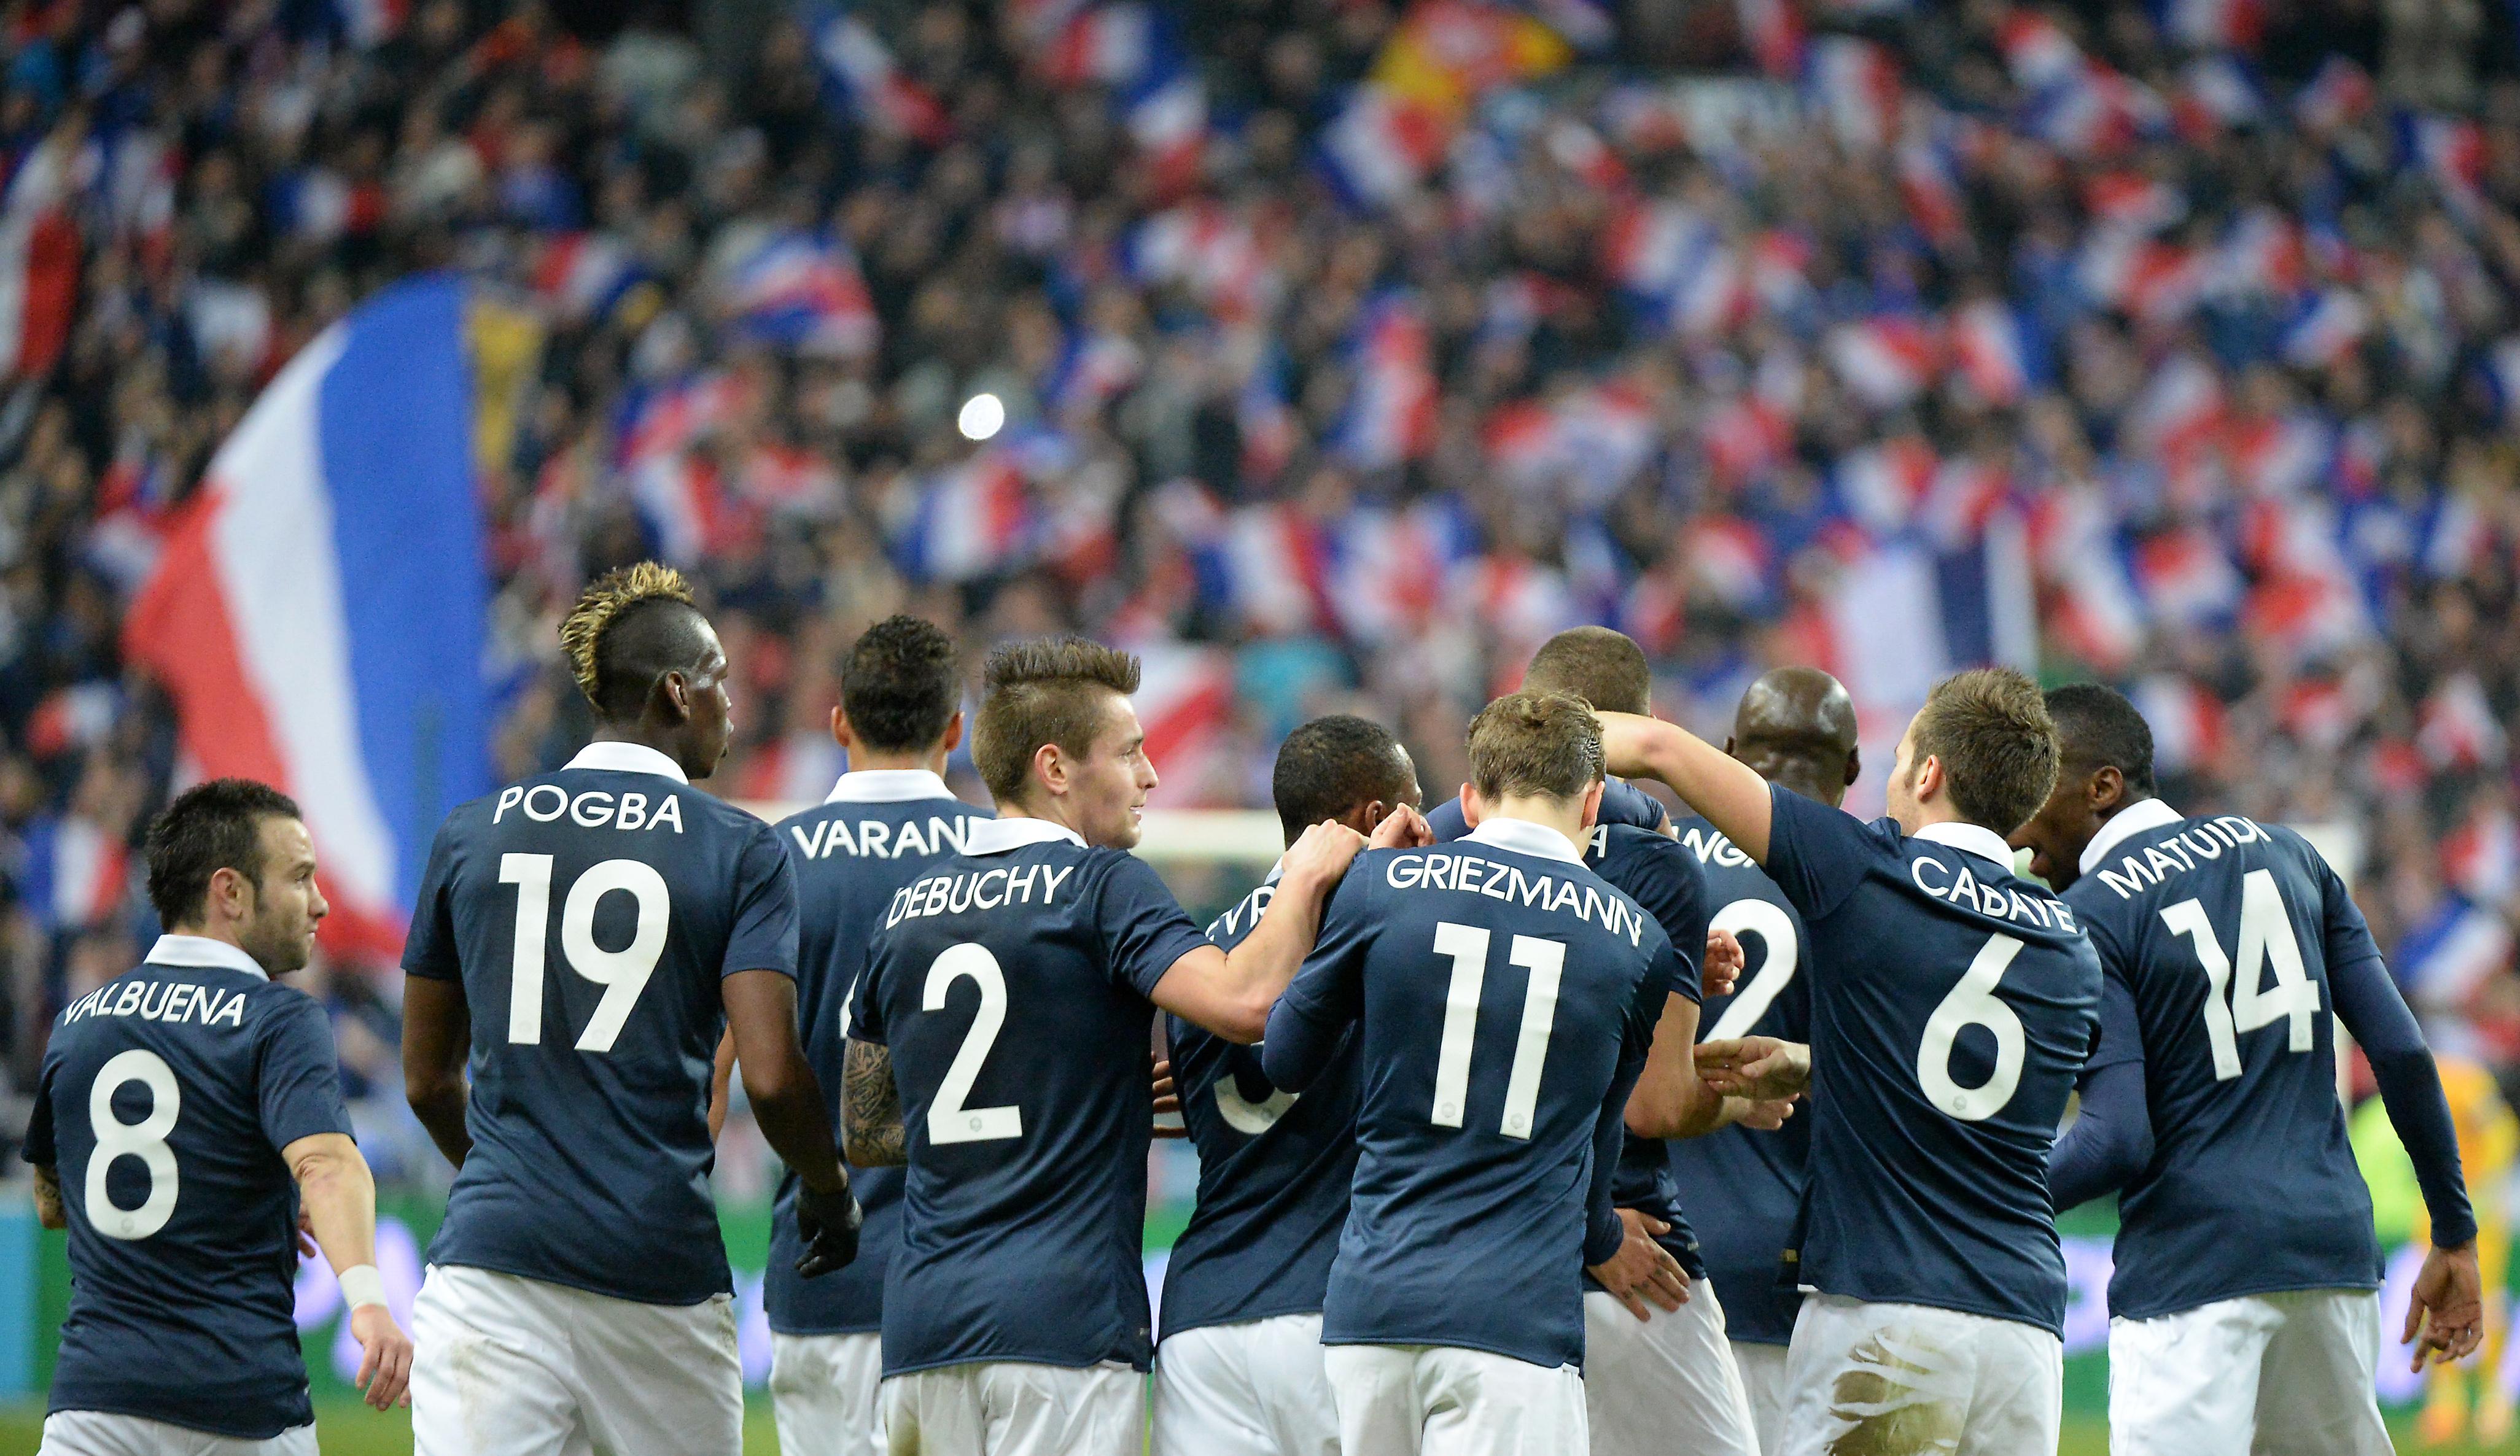 France angleterre foot compositions officielles des quipes - Coupe d europe de foot 2016 ...